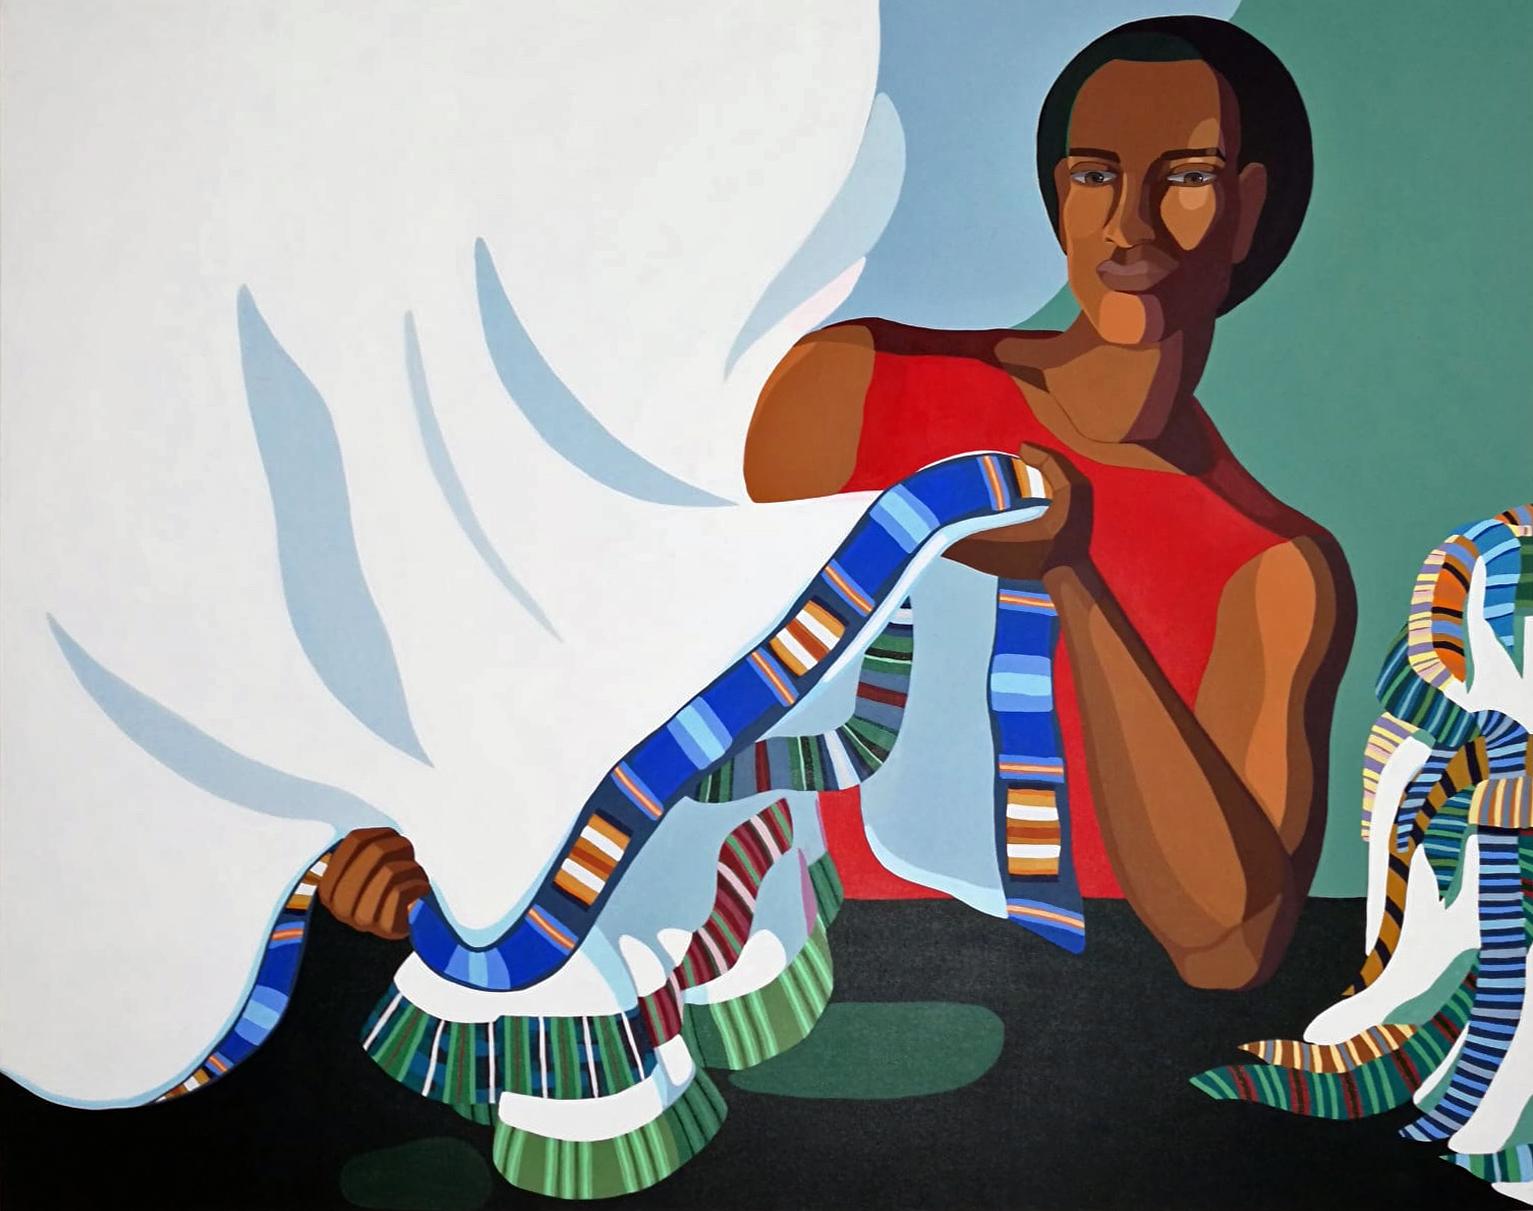 Nirit Takele, Fabcric Seller, 2018, Acrylic on canvas, 135x165 cm